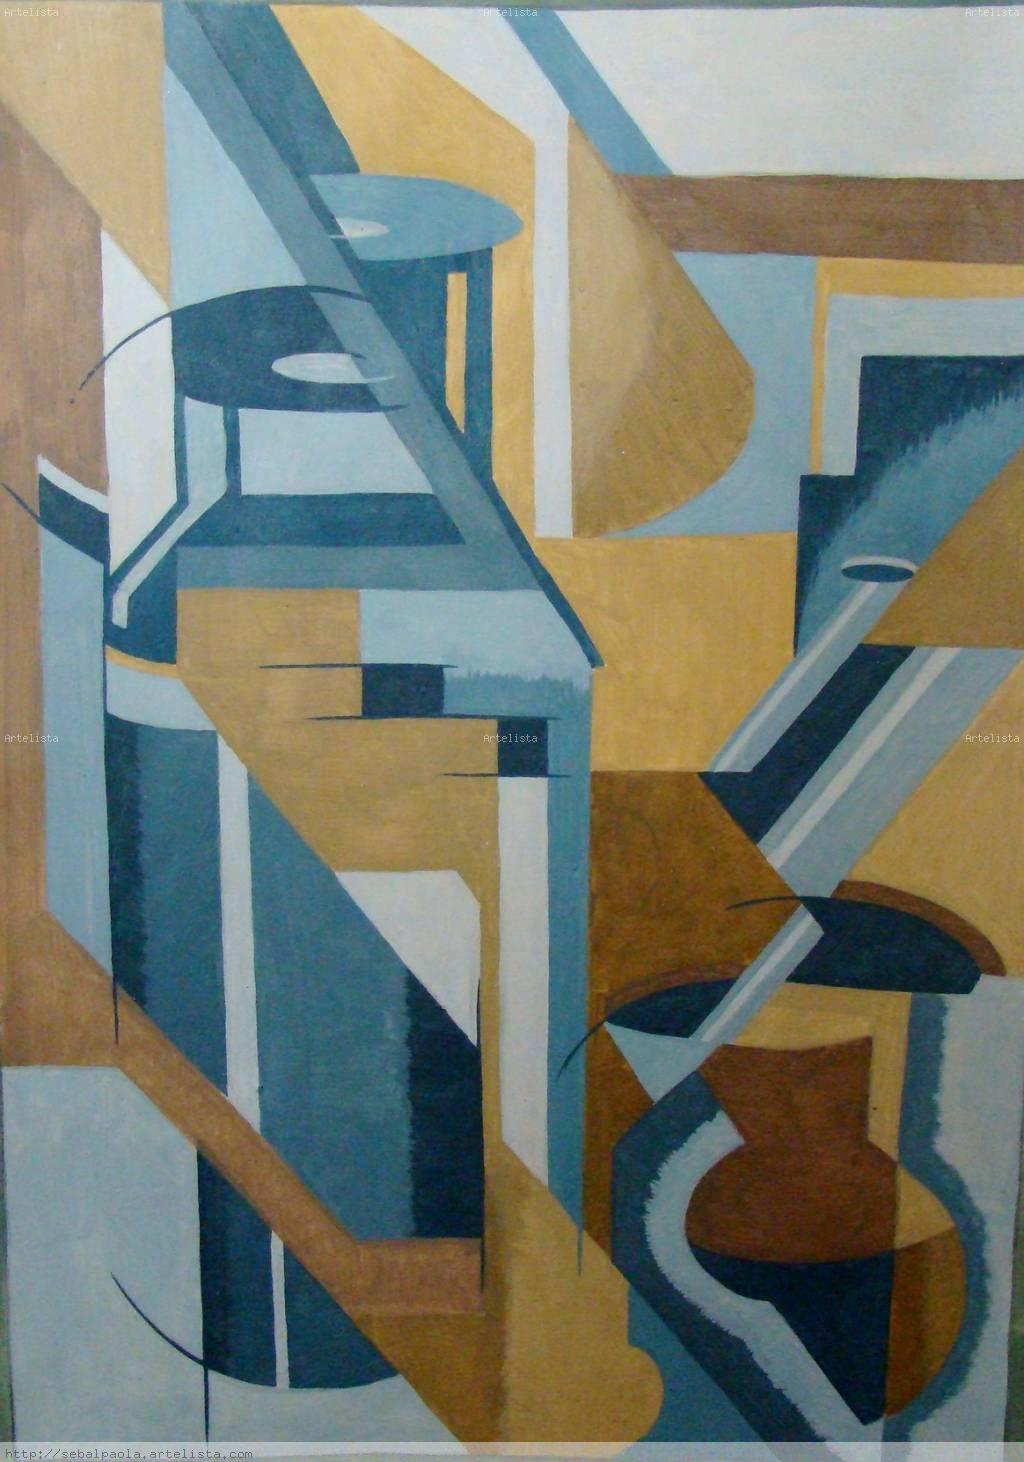 Matero paola sebal for Cuadros con formas geometricas